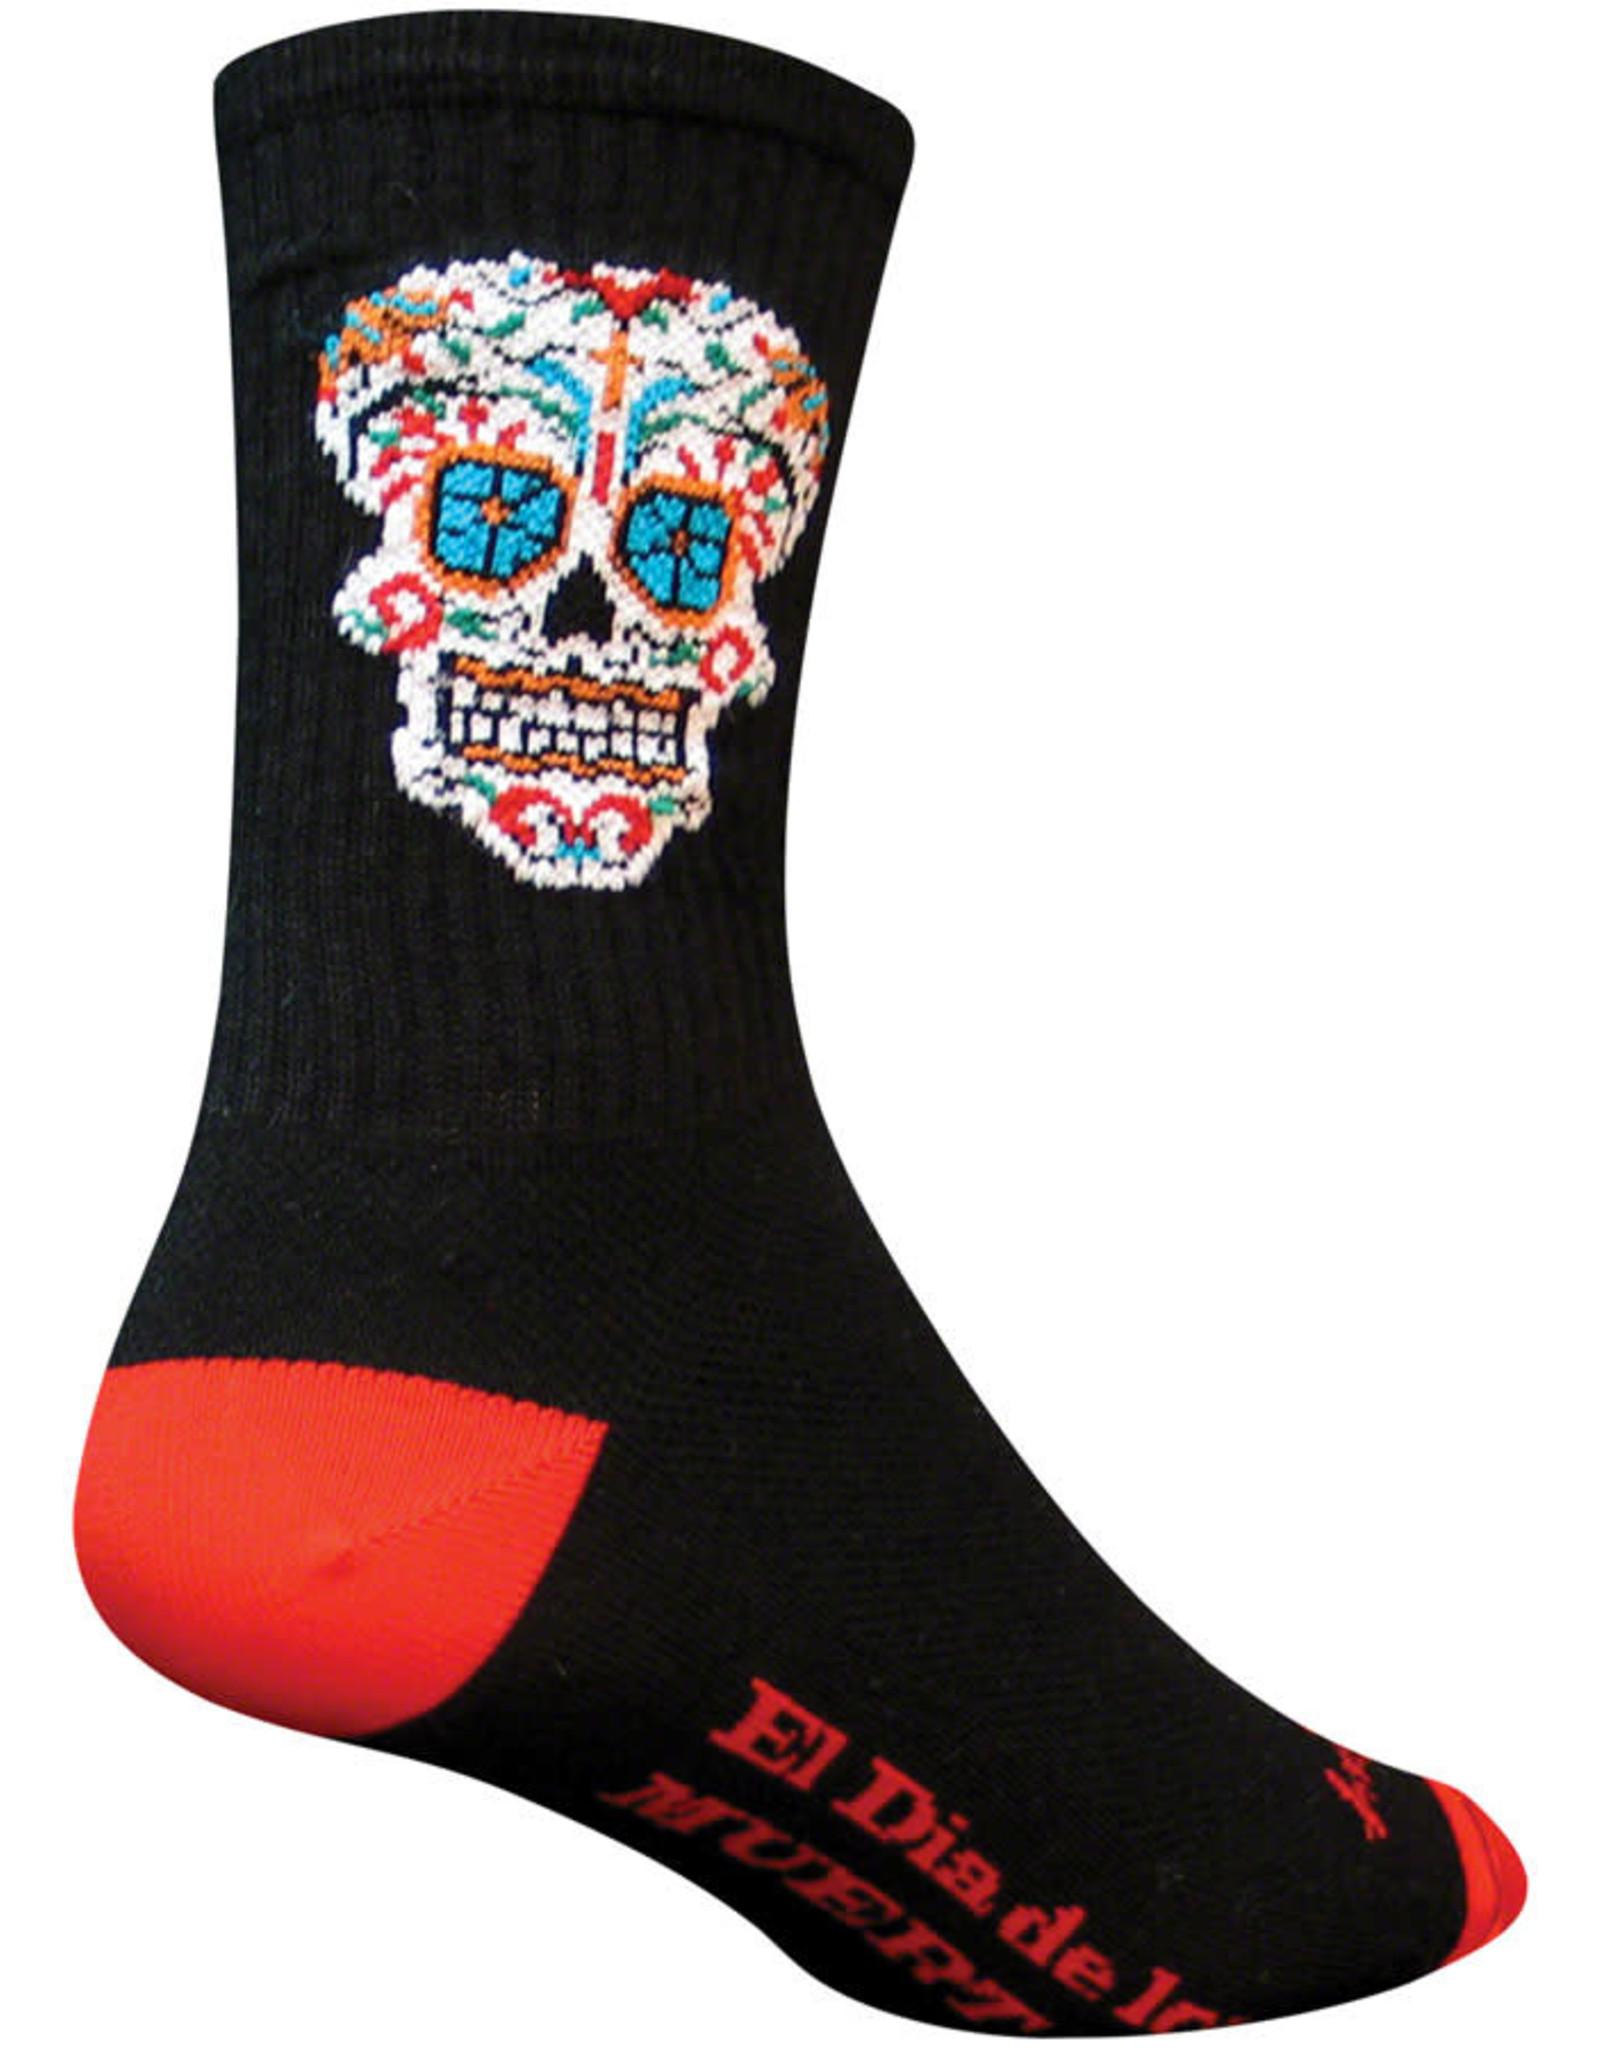 Black SM//MD New SockGuy Gnomies 6 Crew Sock